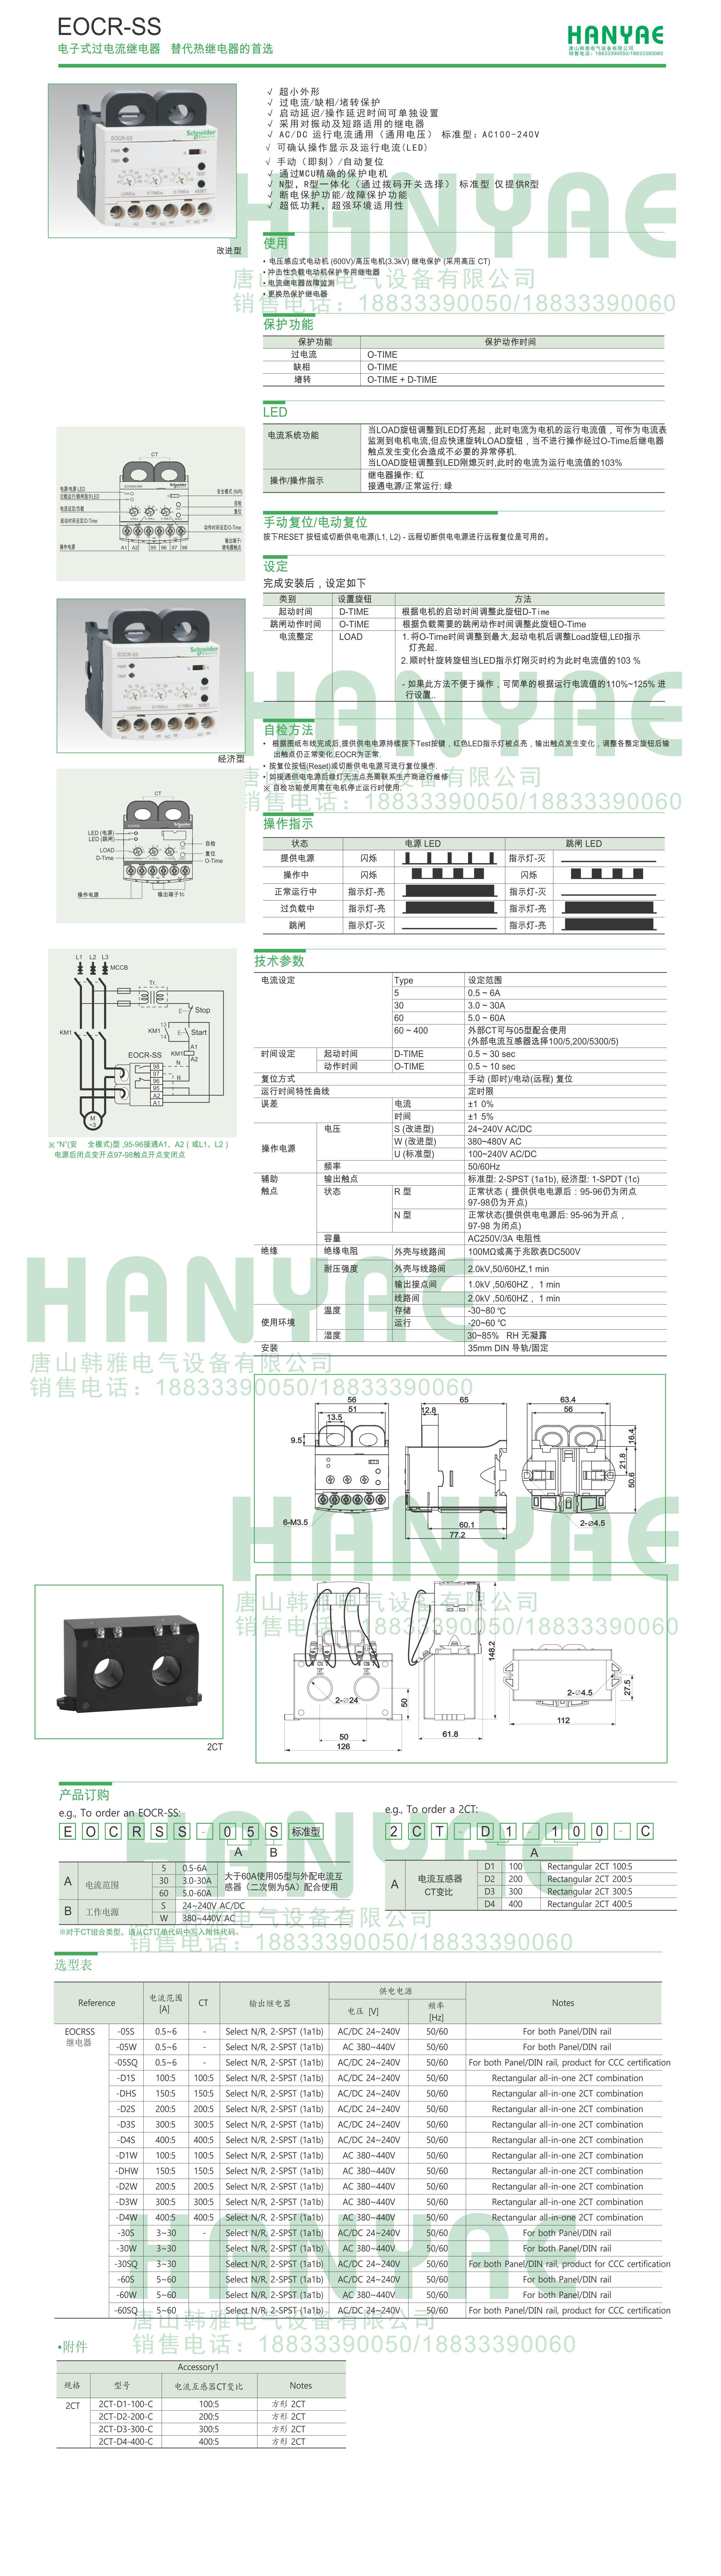 EOCRSS-30RV7电子式继电器 施耐德,韩国三和,韩国SAMWHA,电子式继电器,EOCR-SS